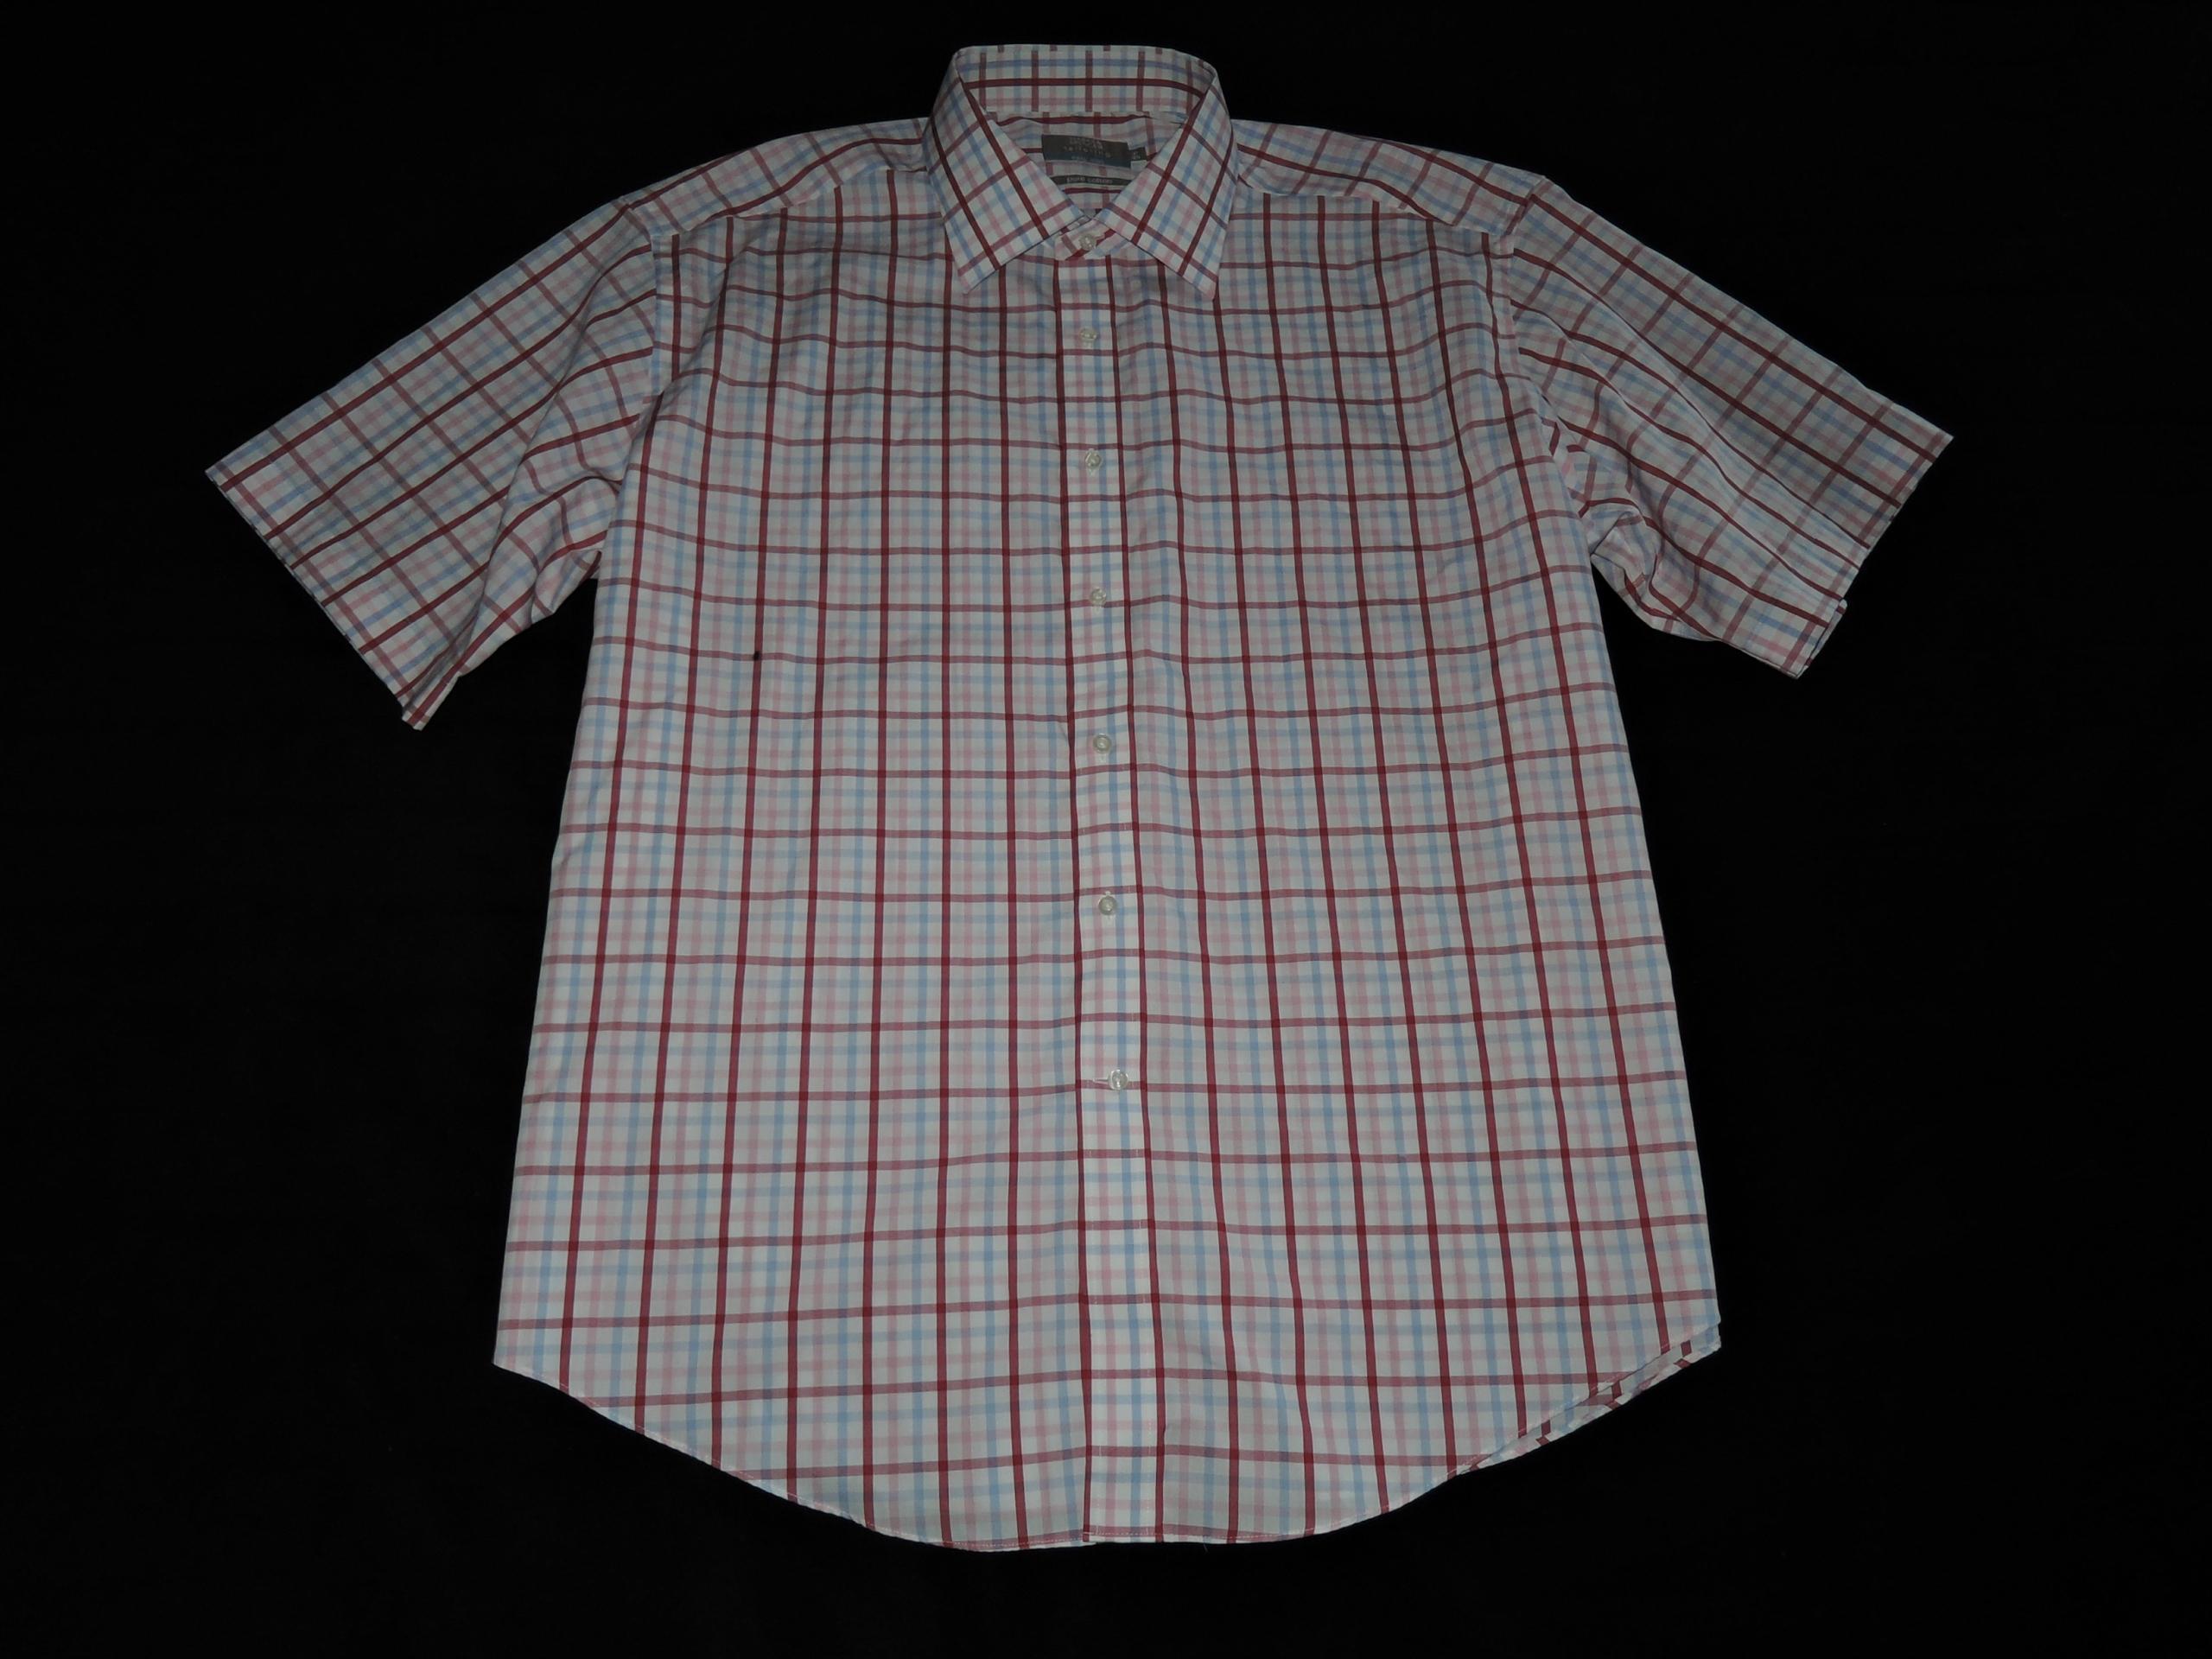 Marks&Spencer Koszula 3XL * 47/18,5